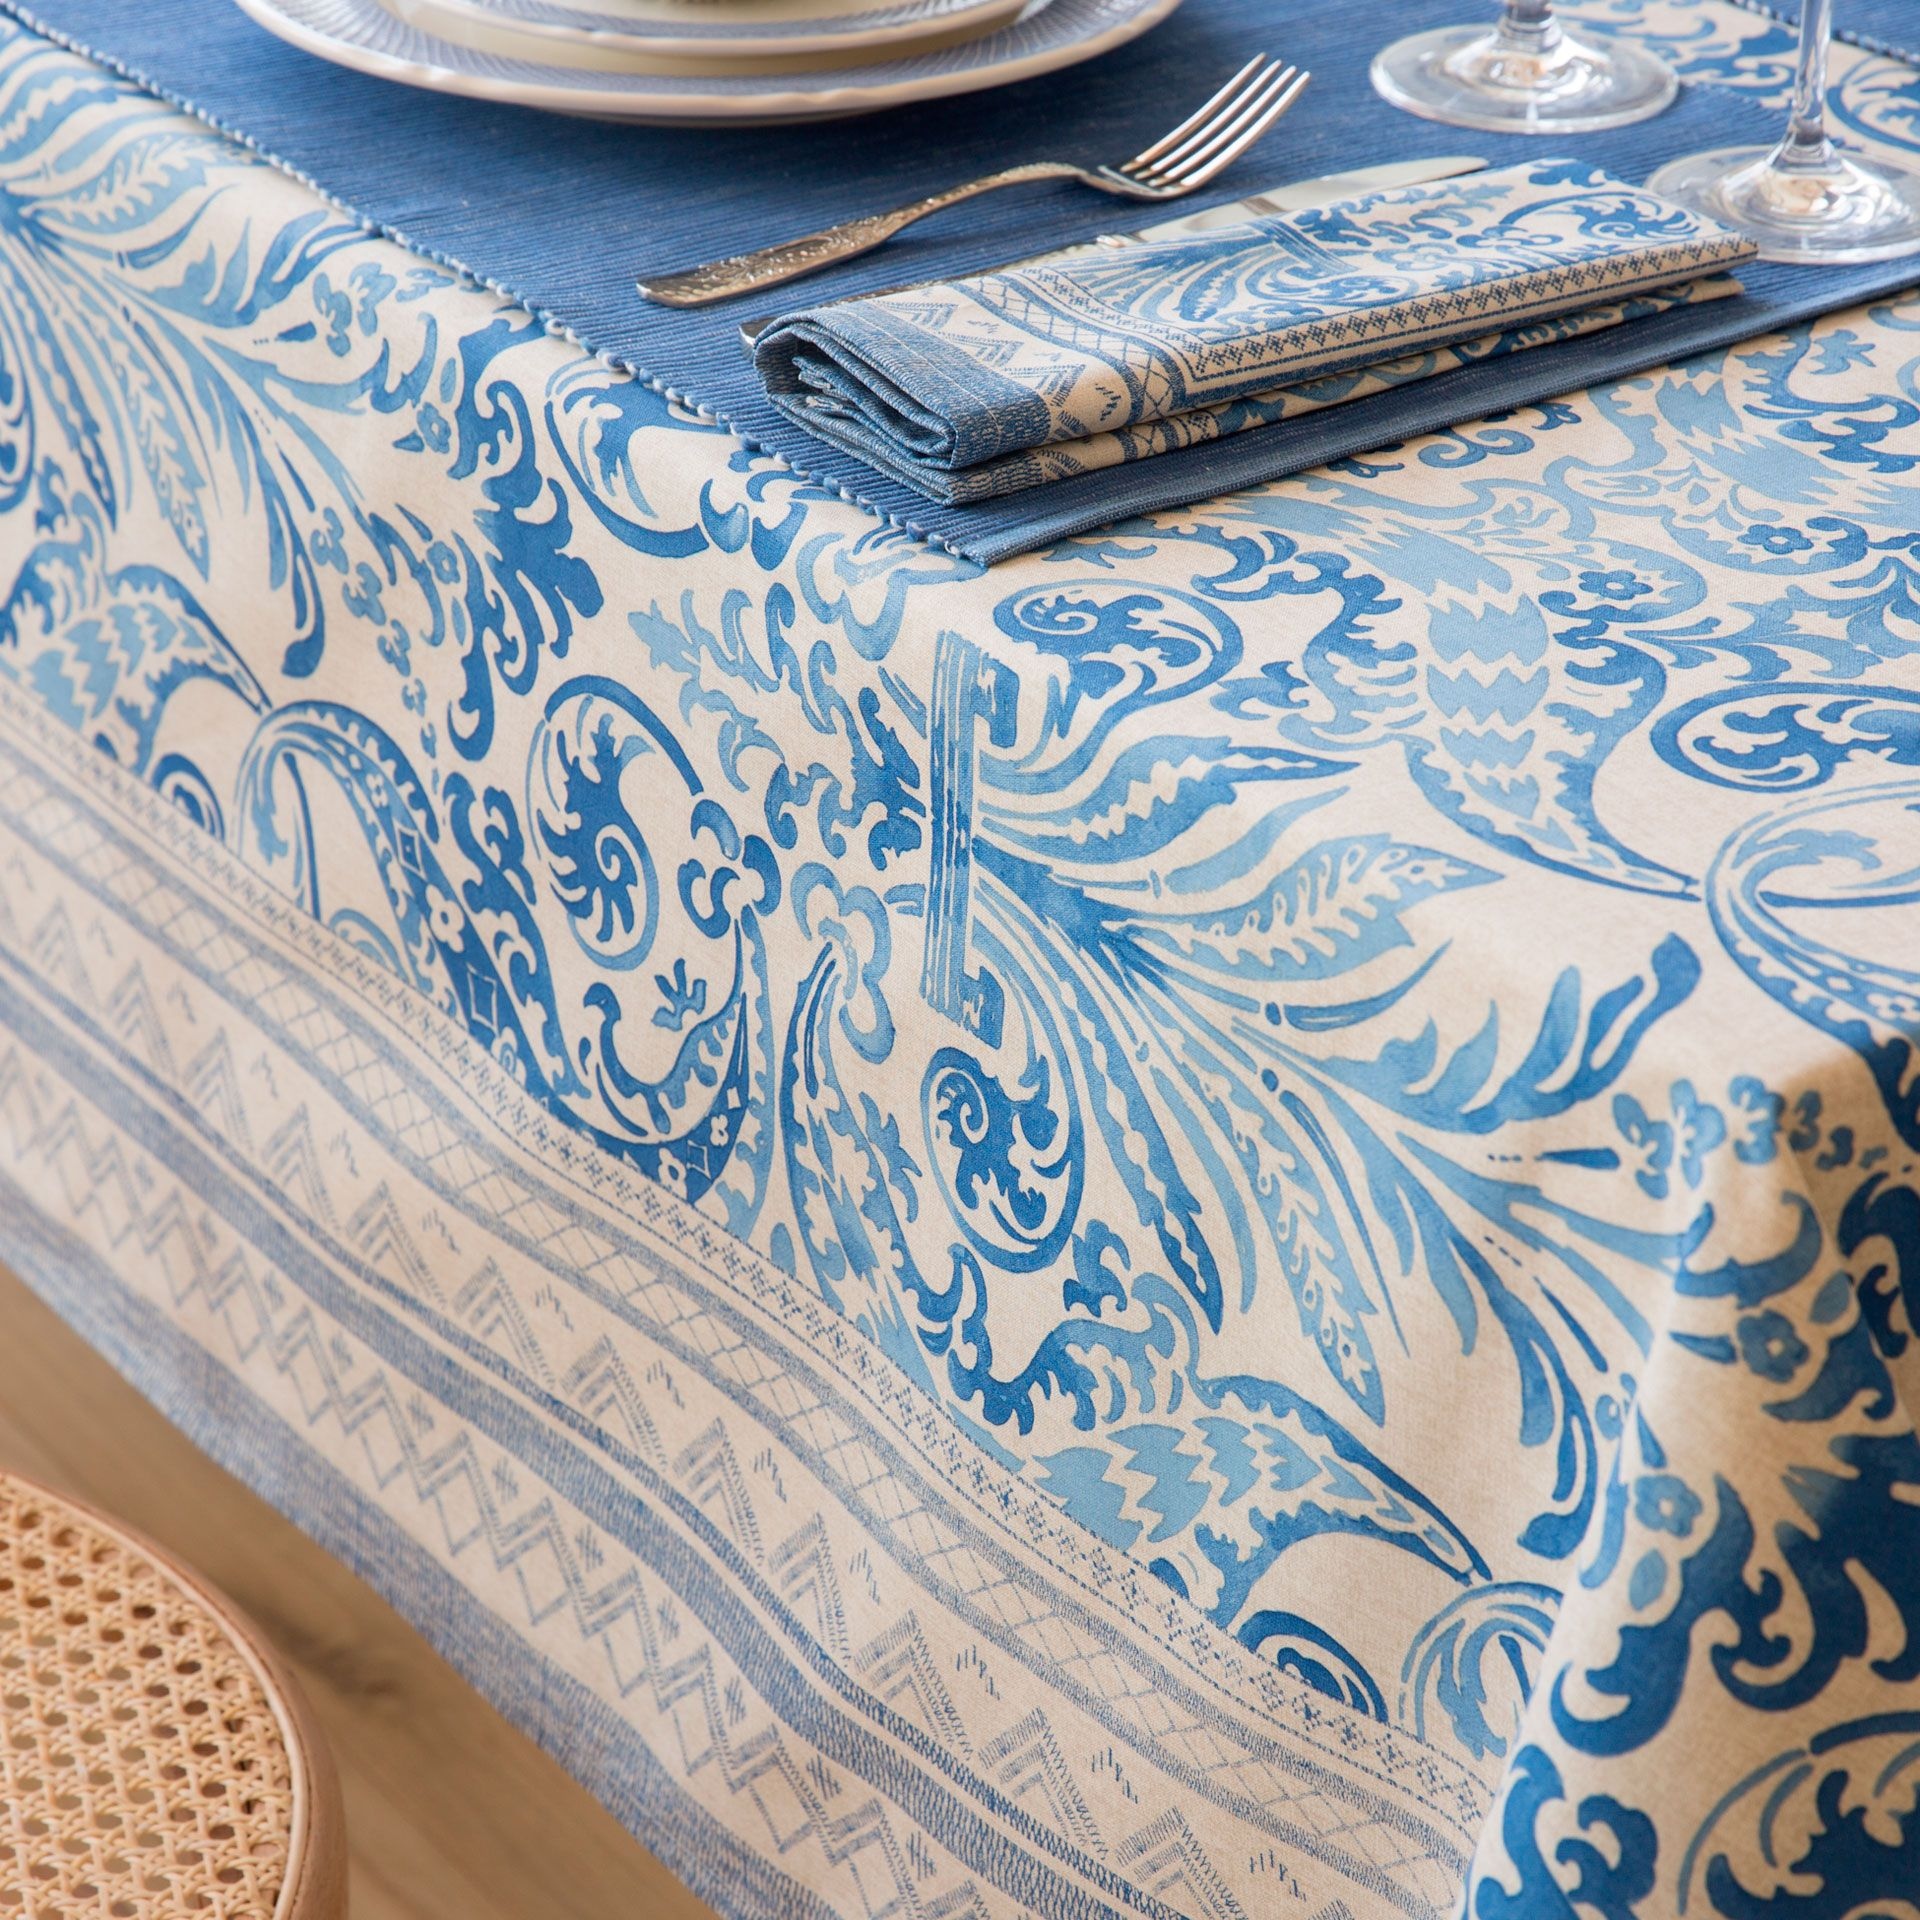 Applique designs for tablecloth - Mosaic Print Tablecloth